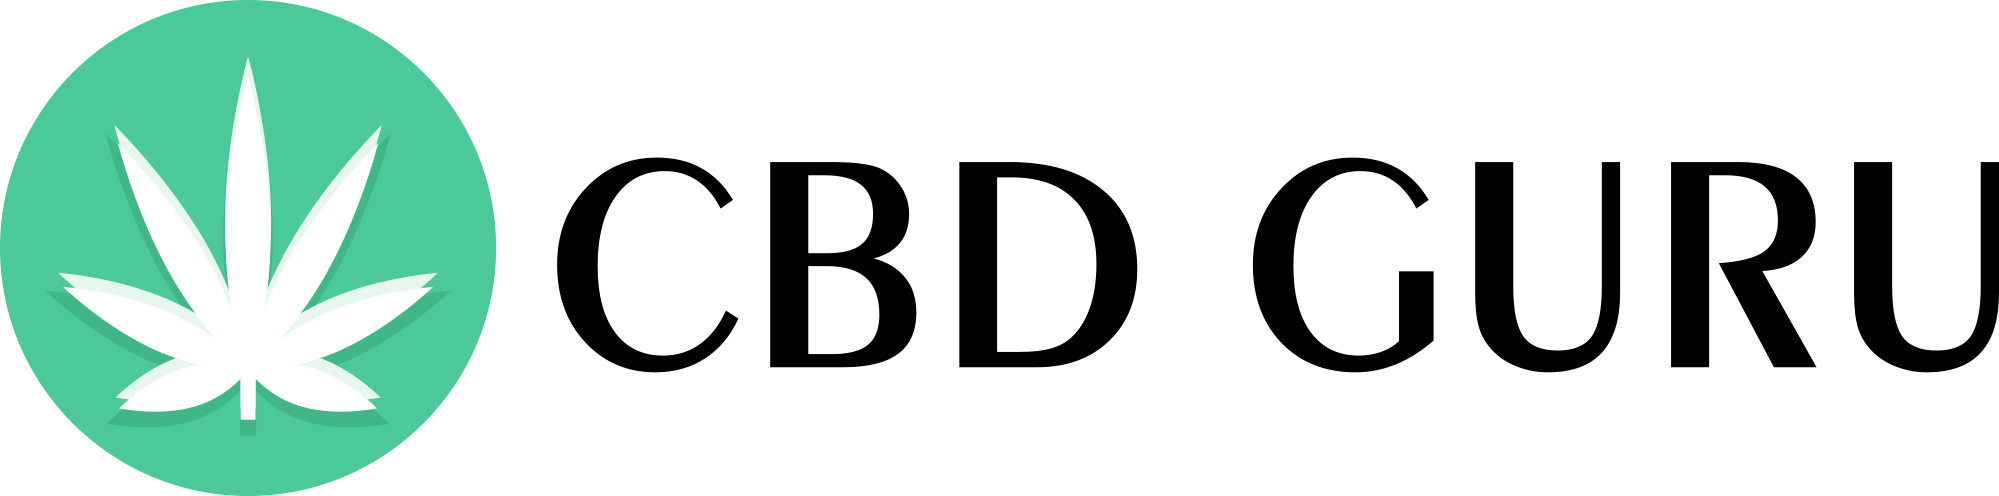 CBD GURU